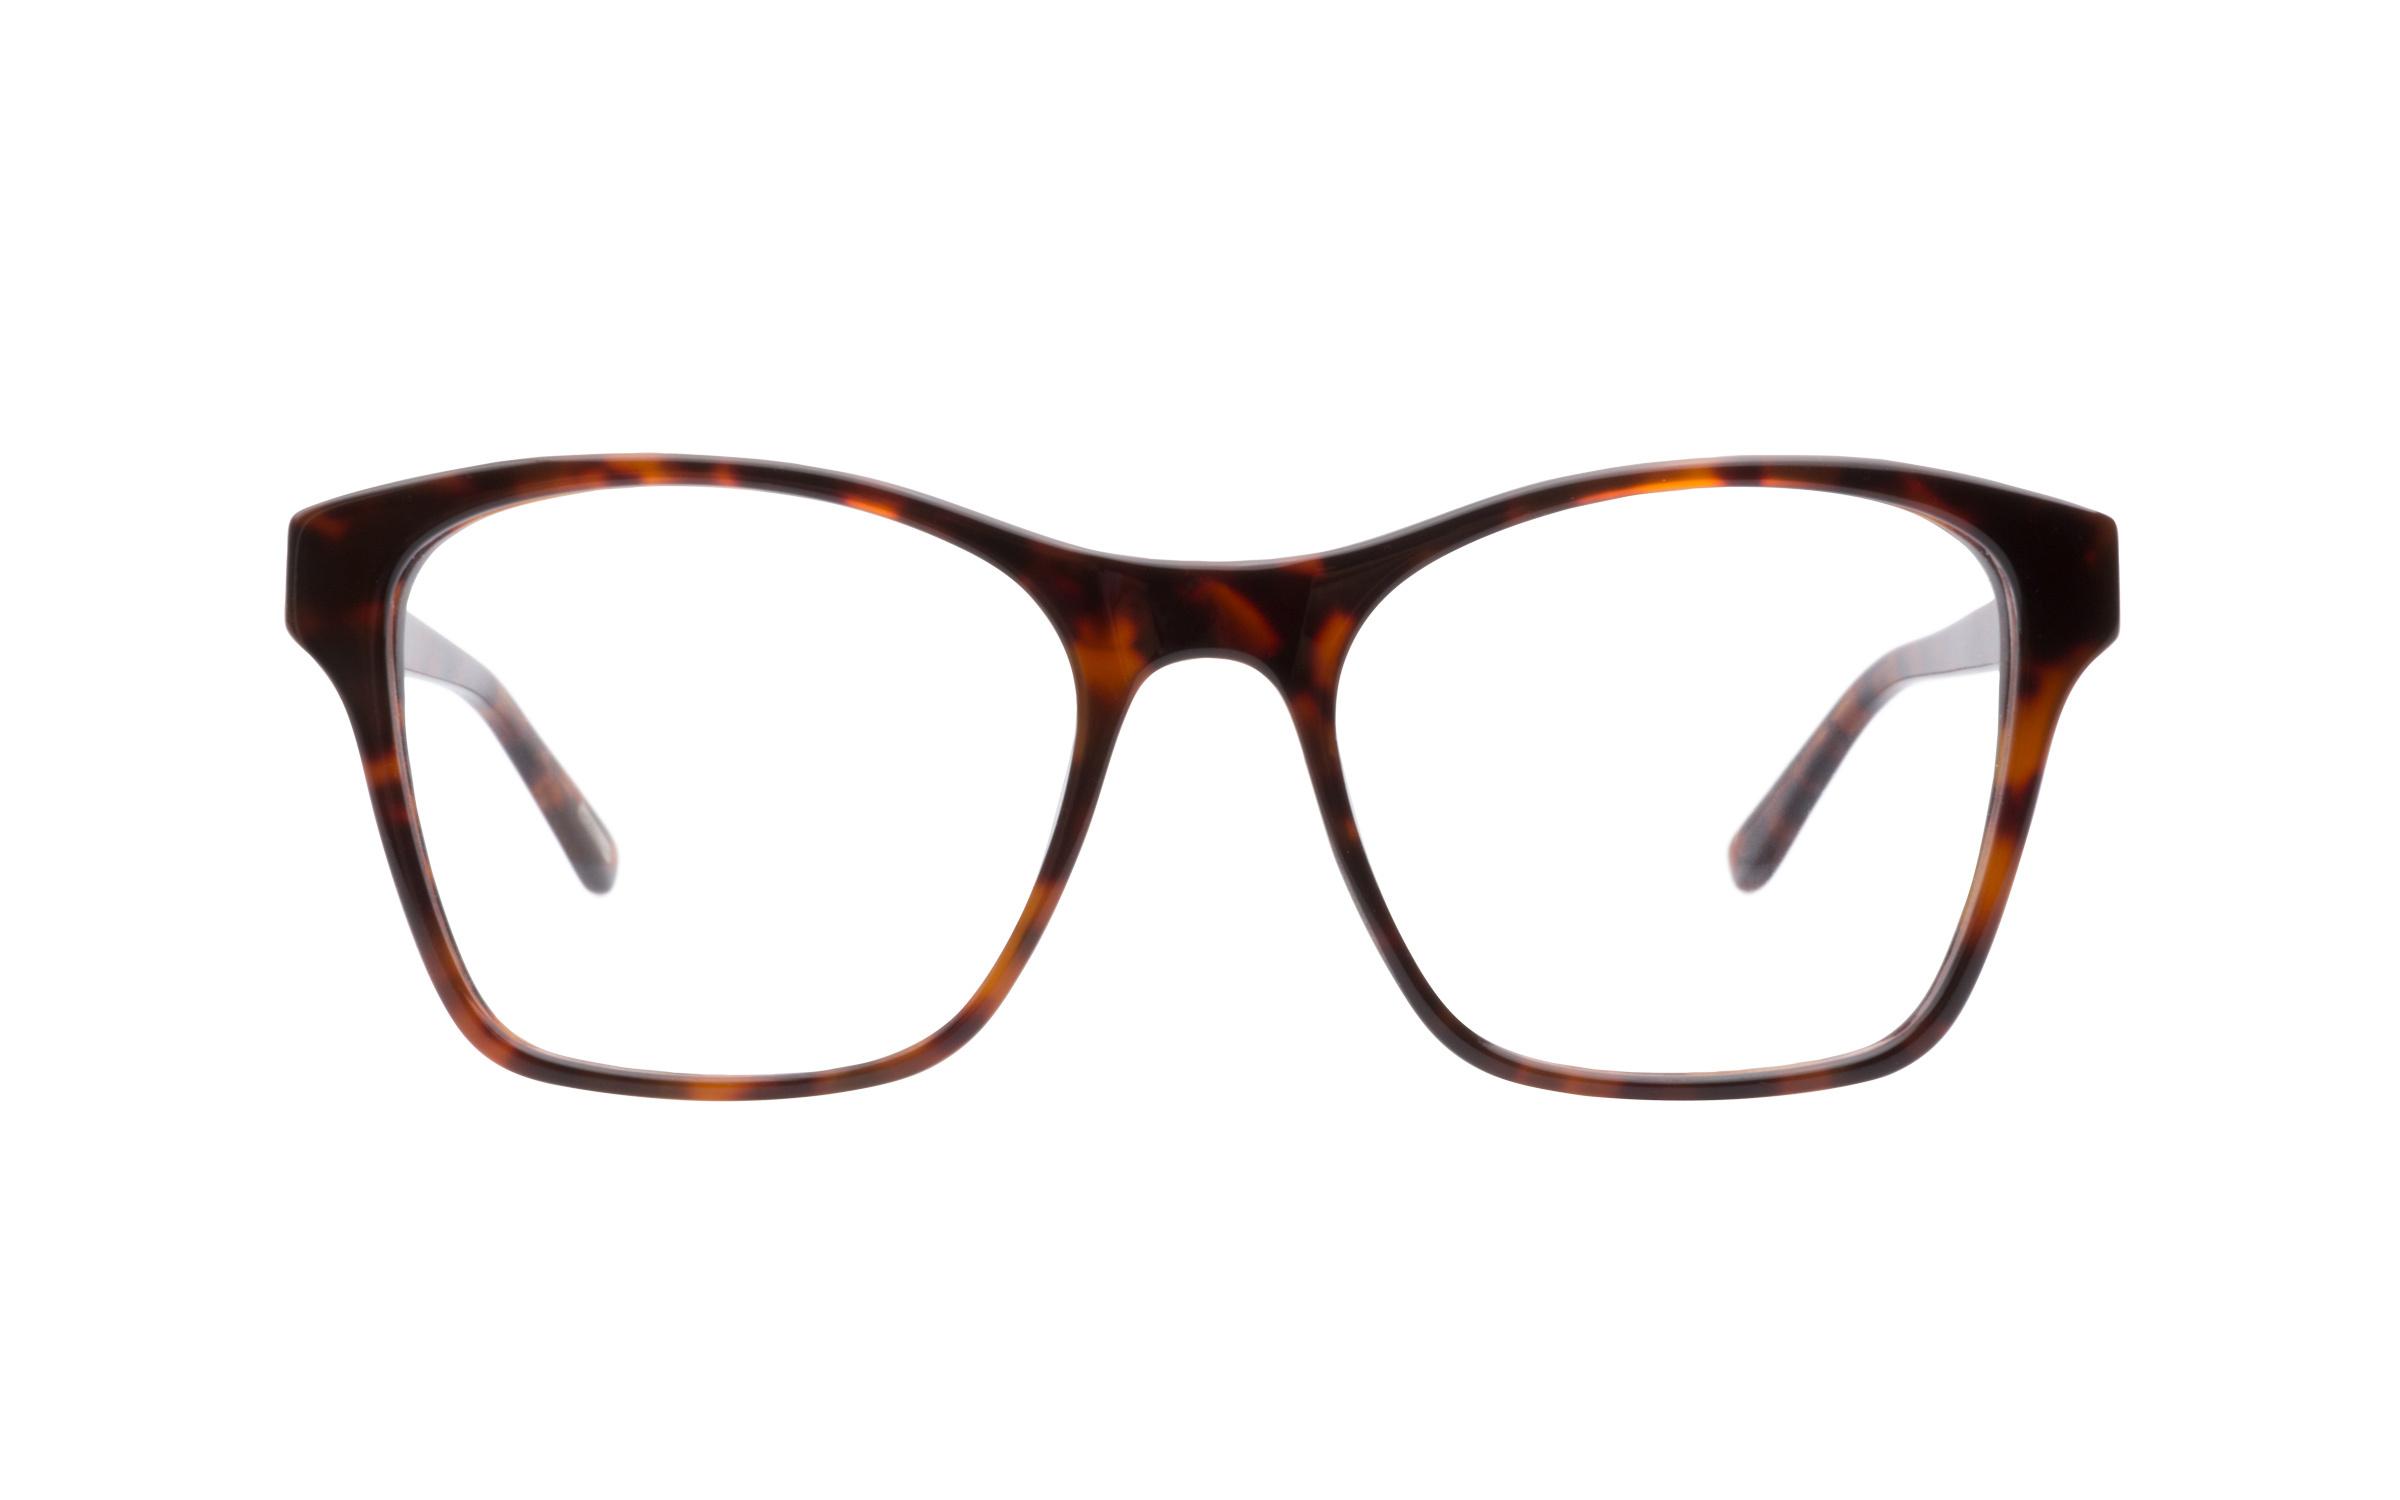 Womens_Retro_Glasses_Tortoise_Kam_Dhillon_Online_Coastal